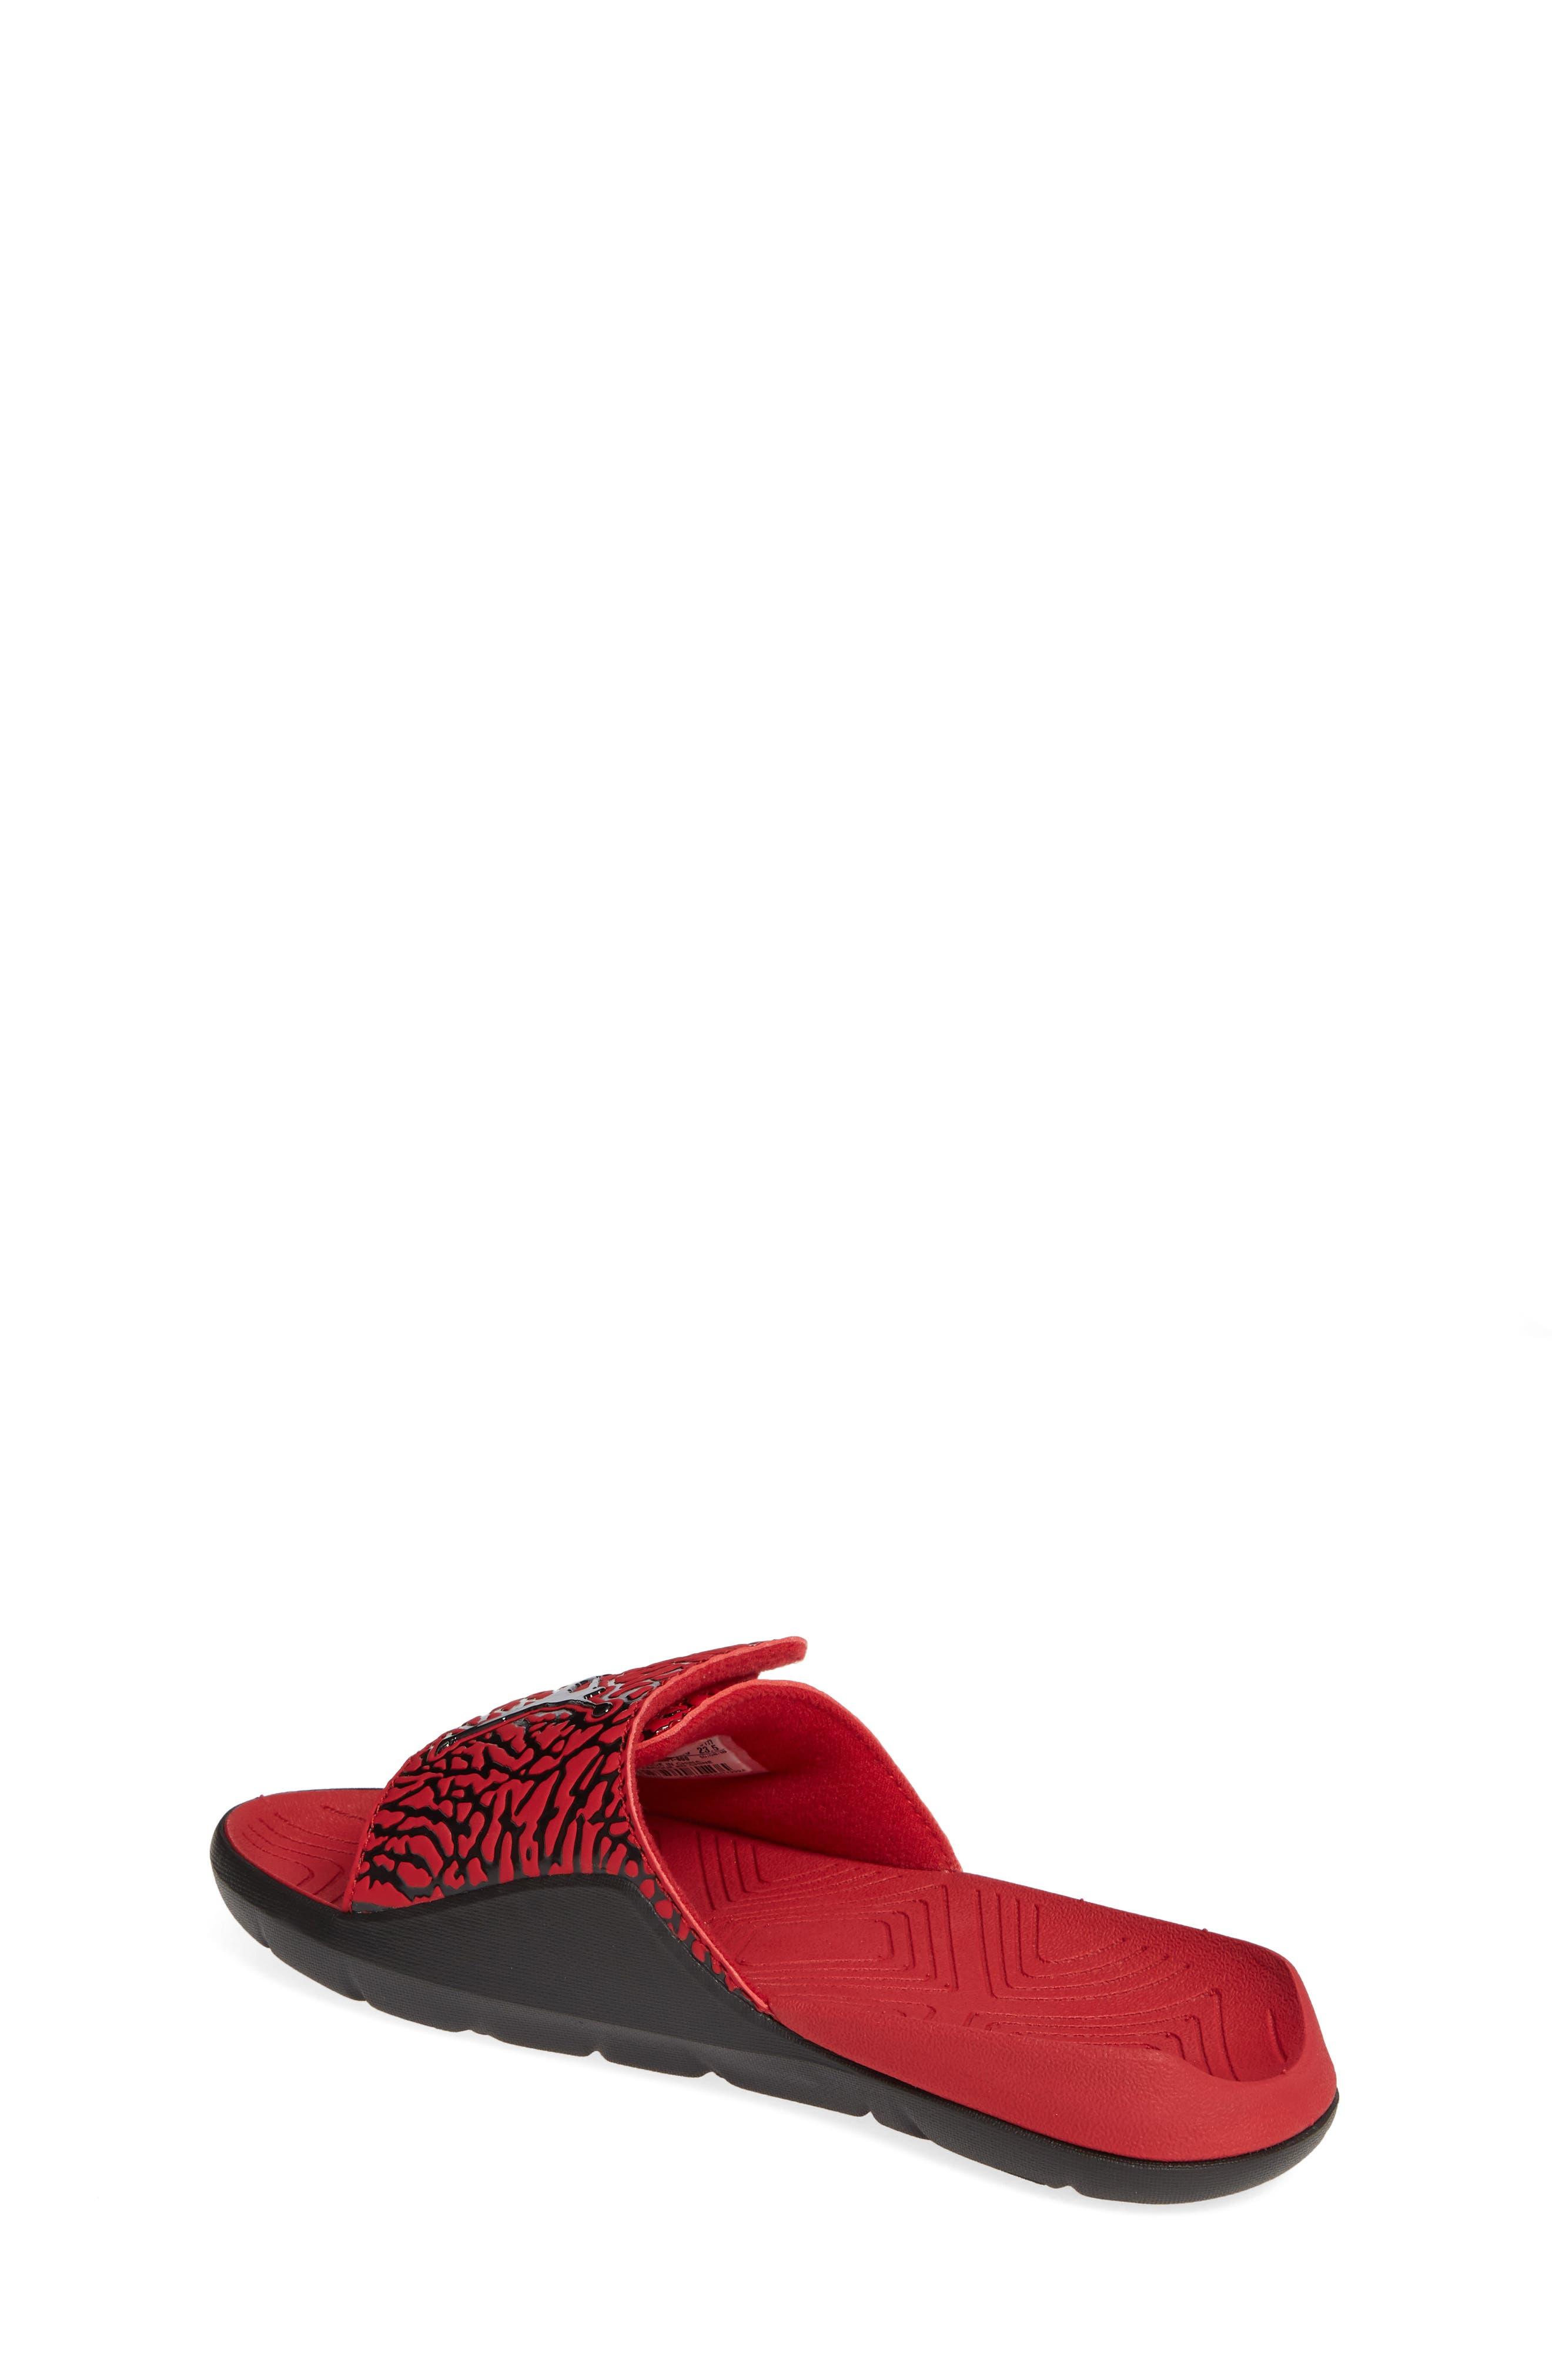 JORDAN, Hydro 7 V2 Sandal, Alternate thumbnail 2, color, GYM RED/ BLACK